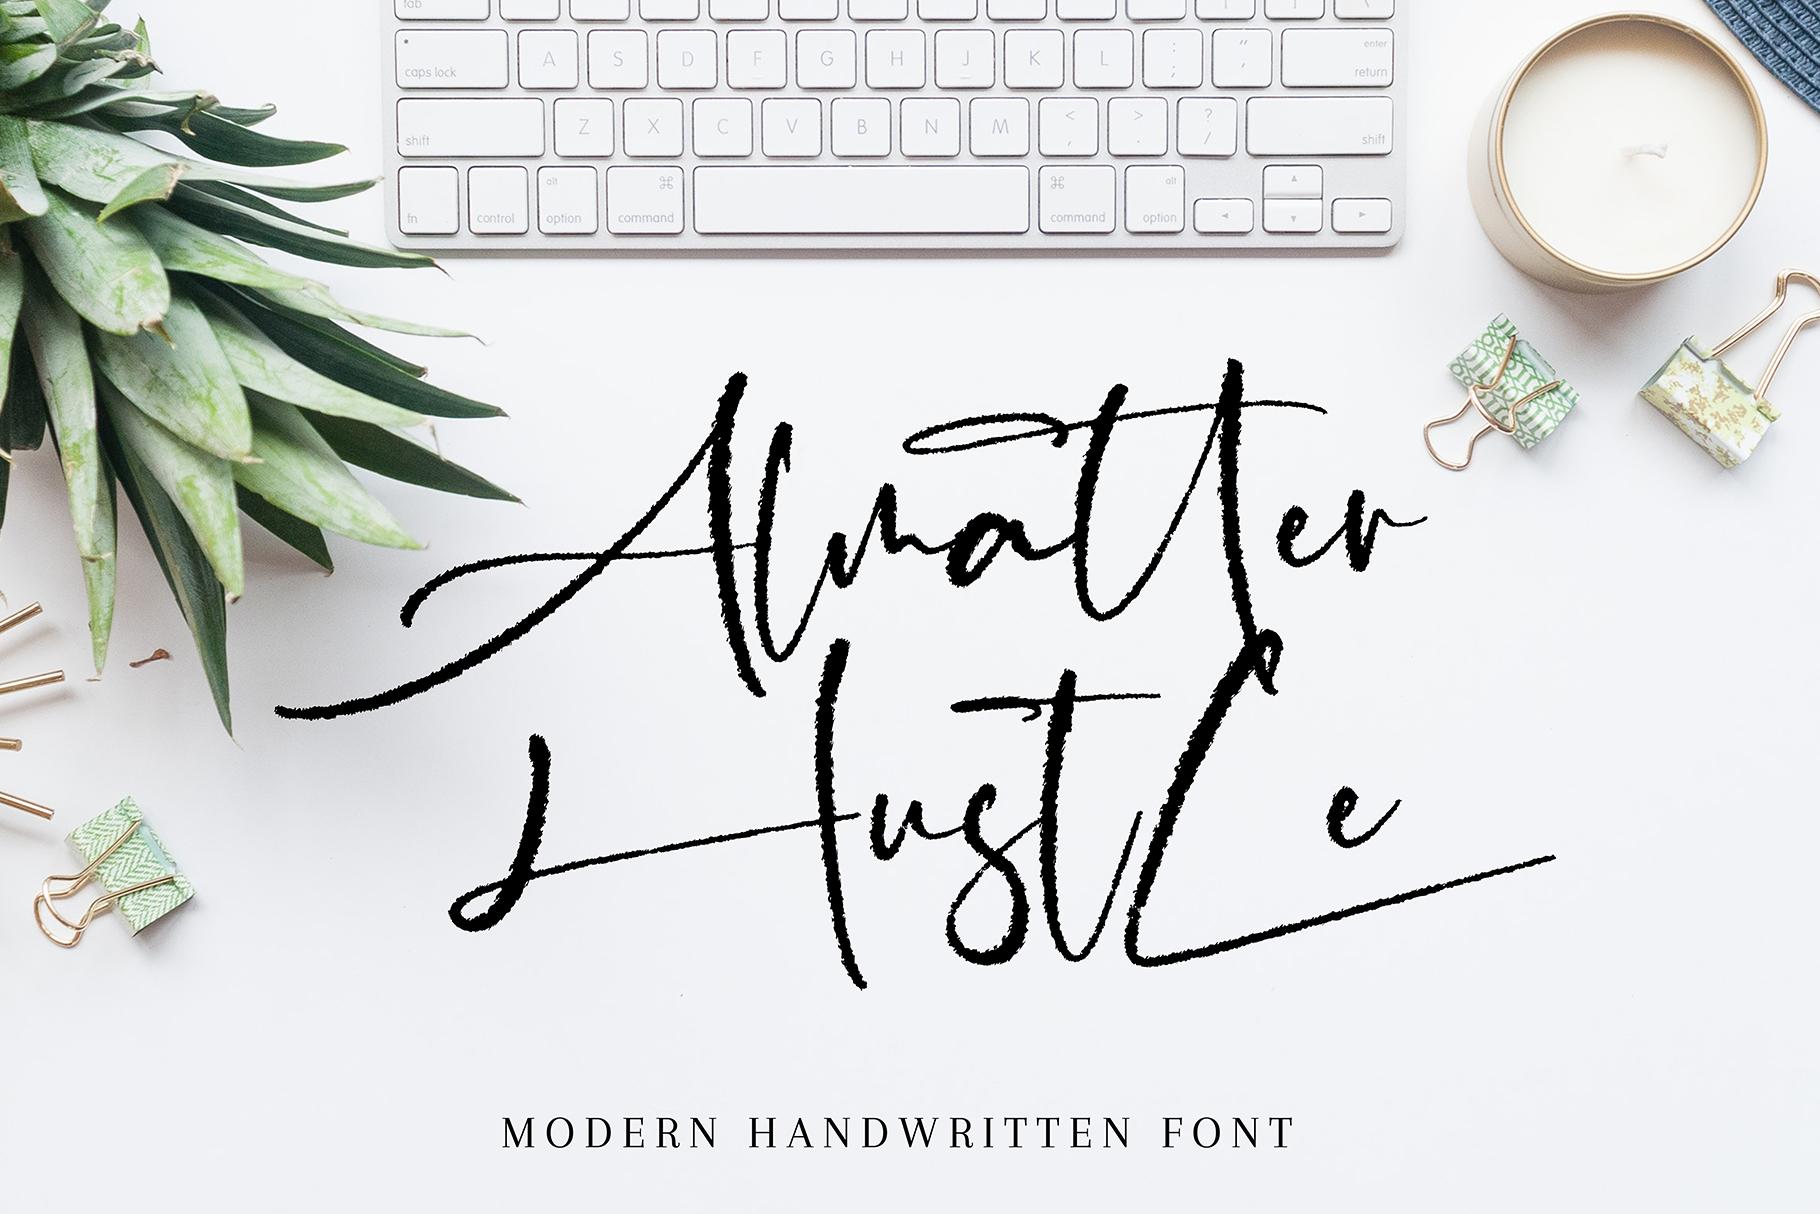 Almatter Hustle example image 1